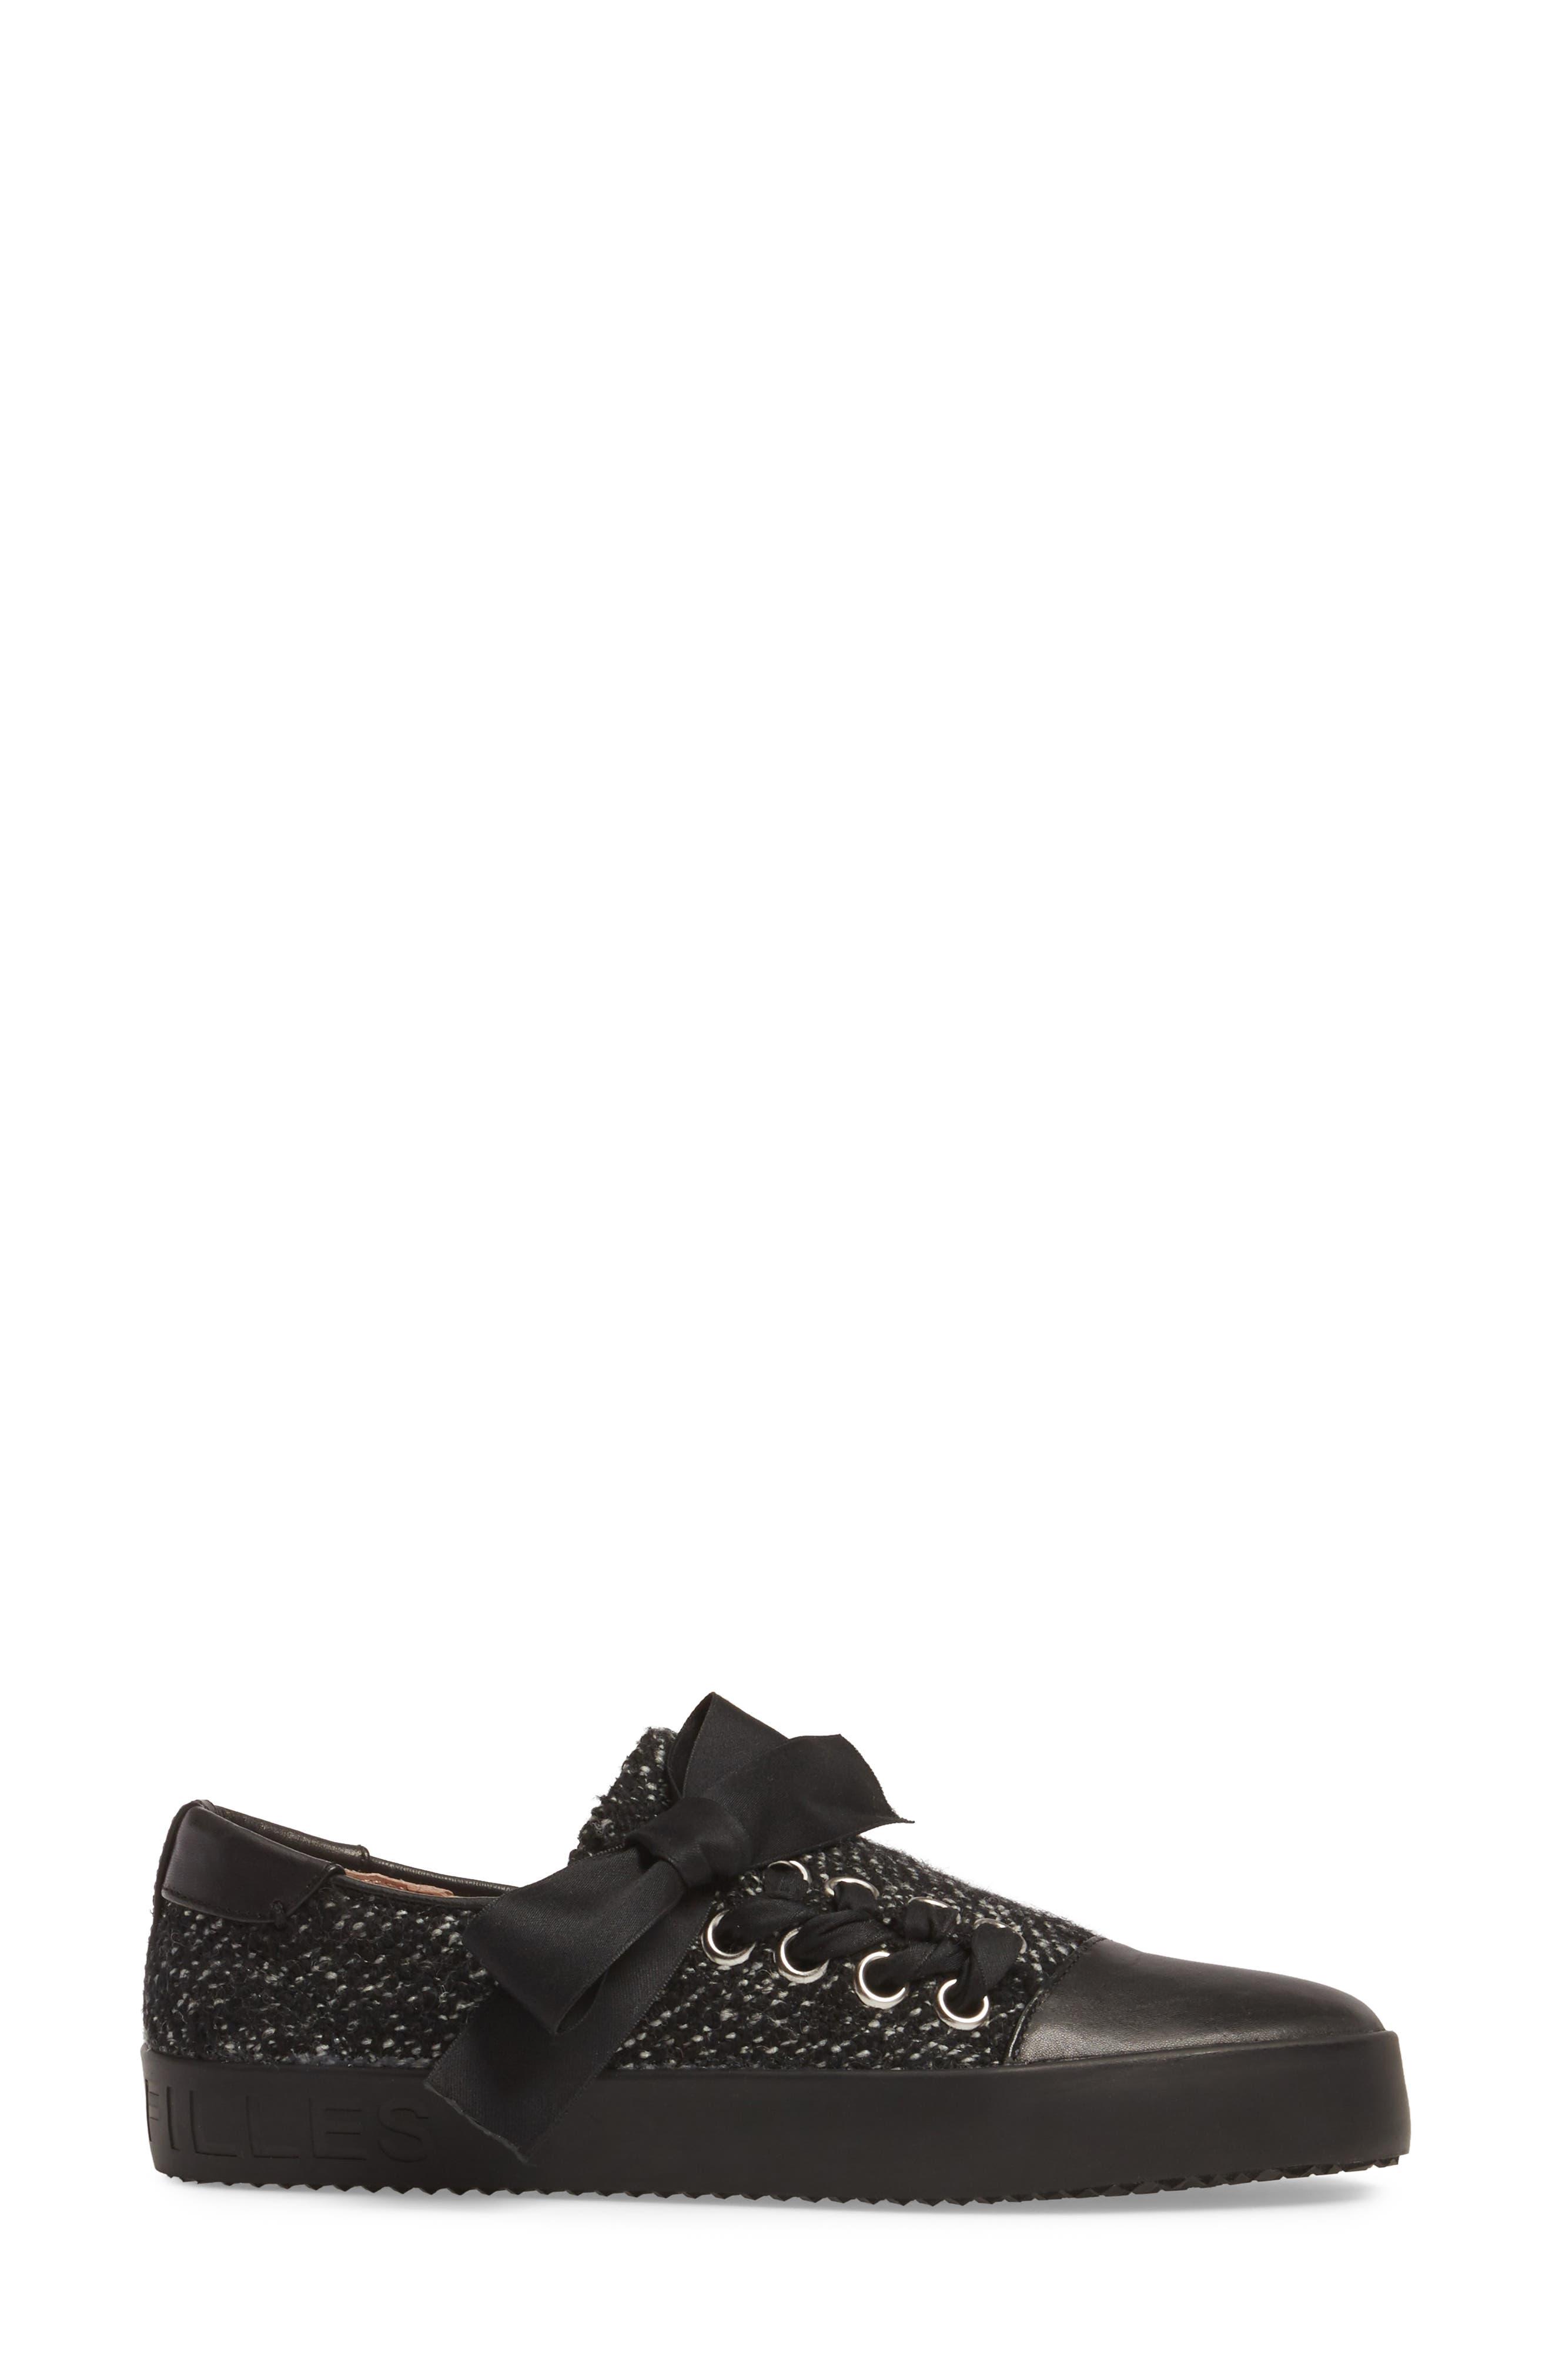 Vera Sneaker,                             Alternate thumbnail 3, color,                             001